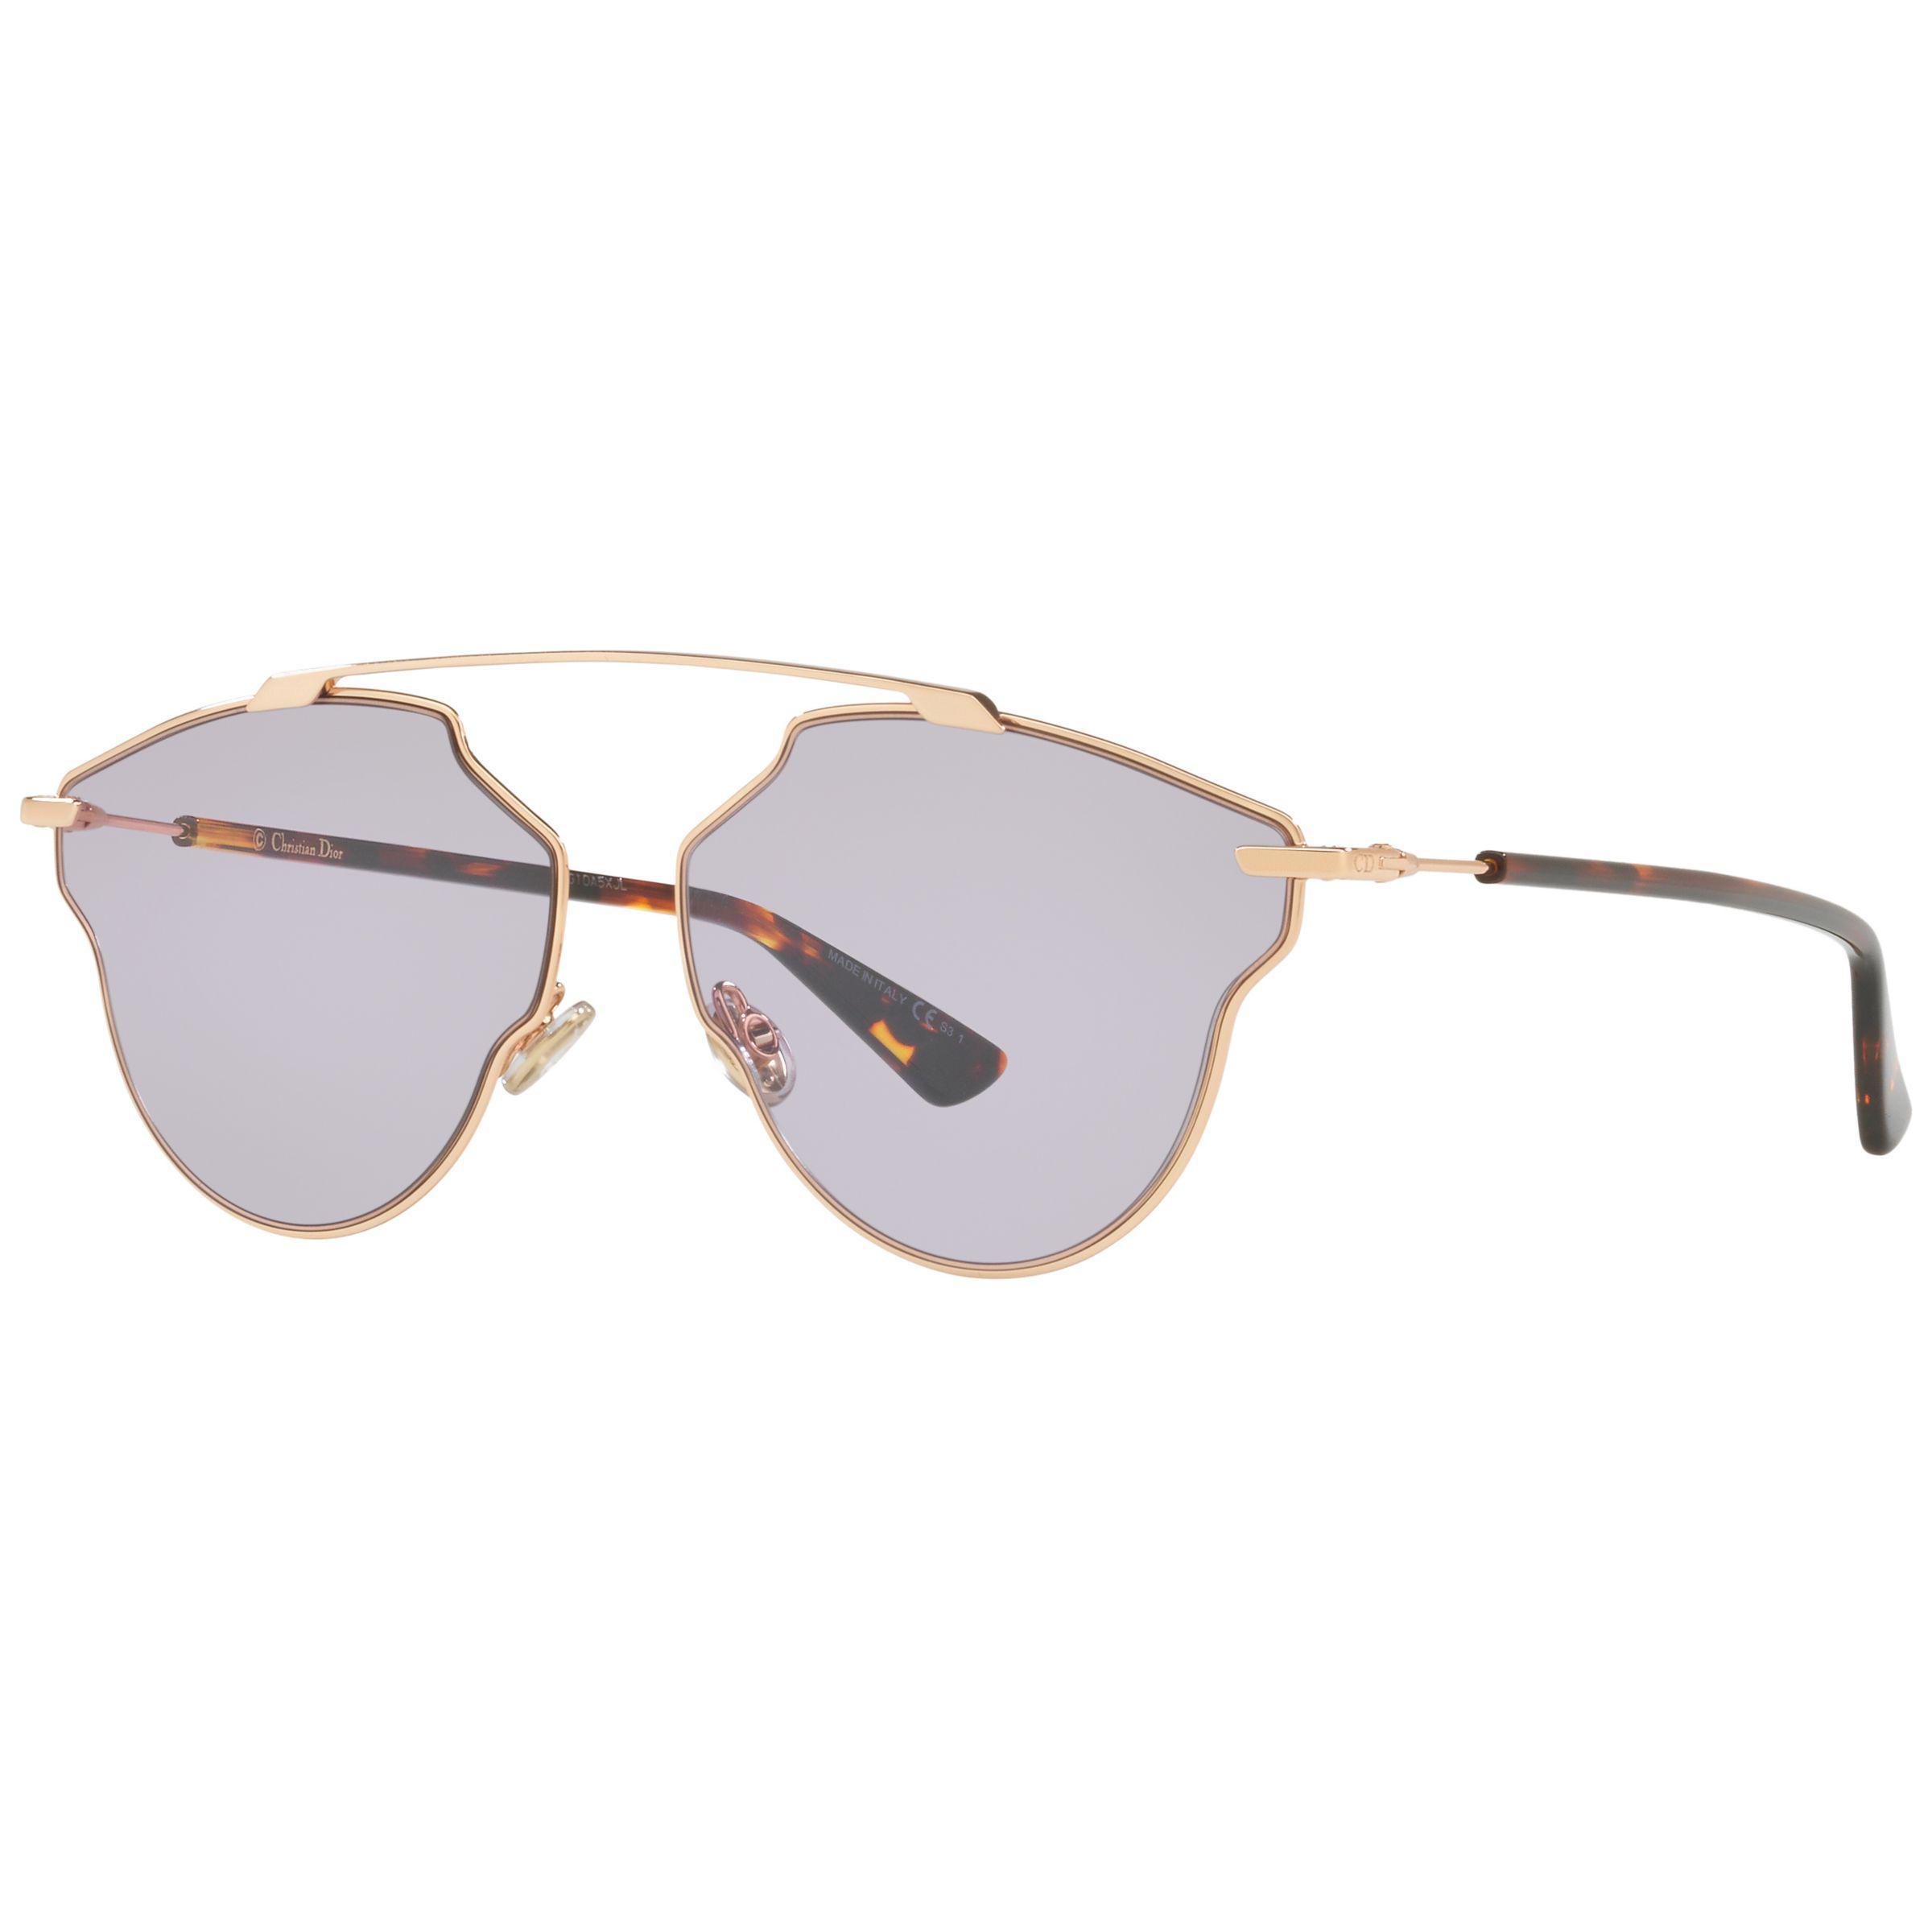 aef2775b14fb Dior. Women's Metallic Sorealpop Aviator Sunglasses. £309 From John Lewis  and Partners